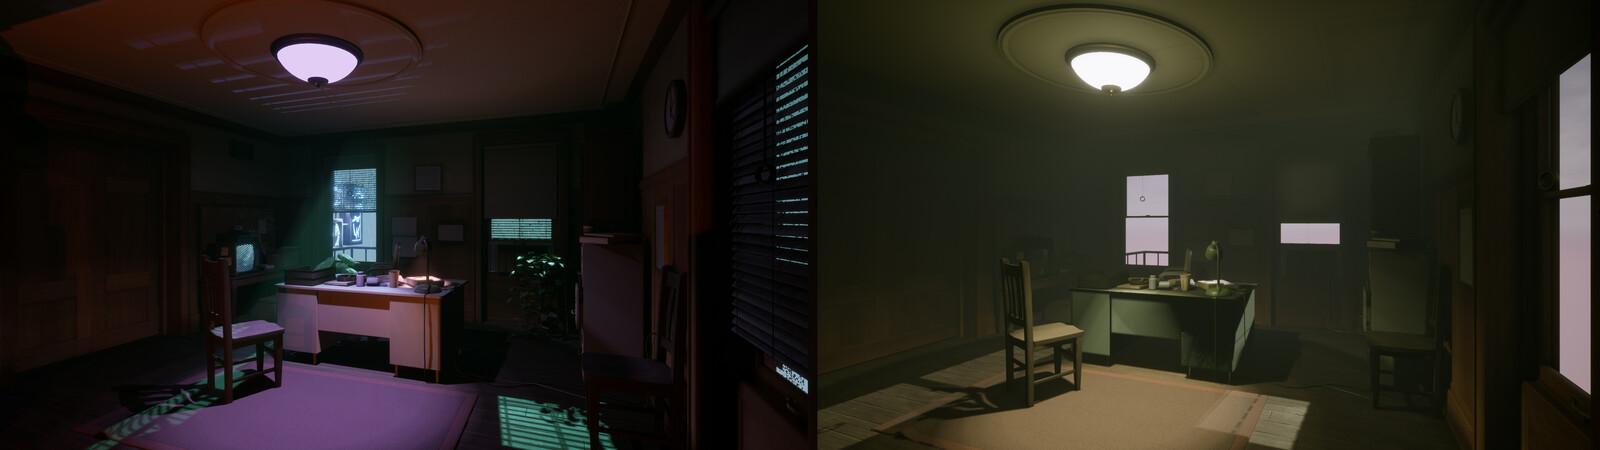 My relighted scene / the original scene